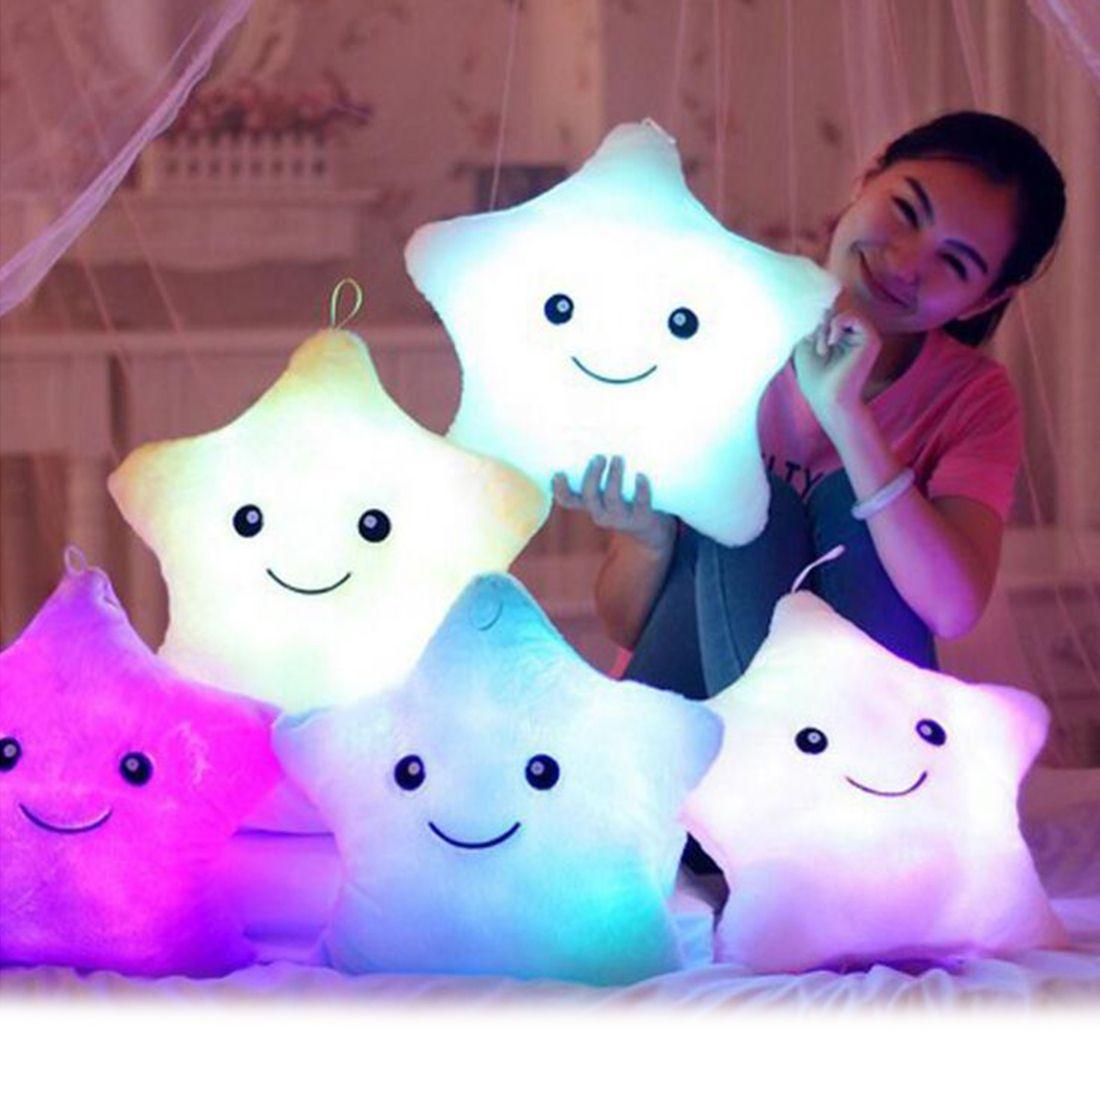 36cm Colorful Body Pillow Star Luminous LED Light Pillow Cushion Soft Relax Gift Smile Body Pillow Kids <font><b>Birthday</b></font> Xmas Gift decor